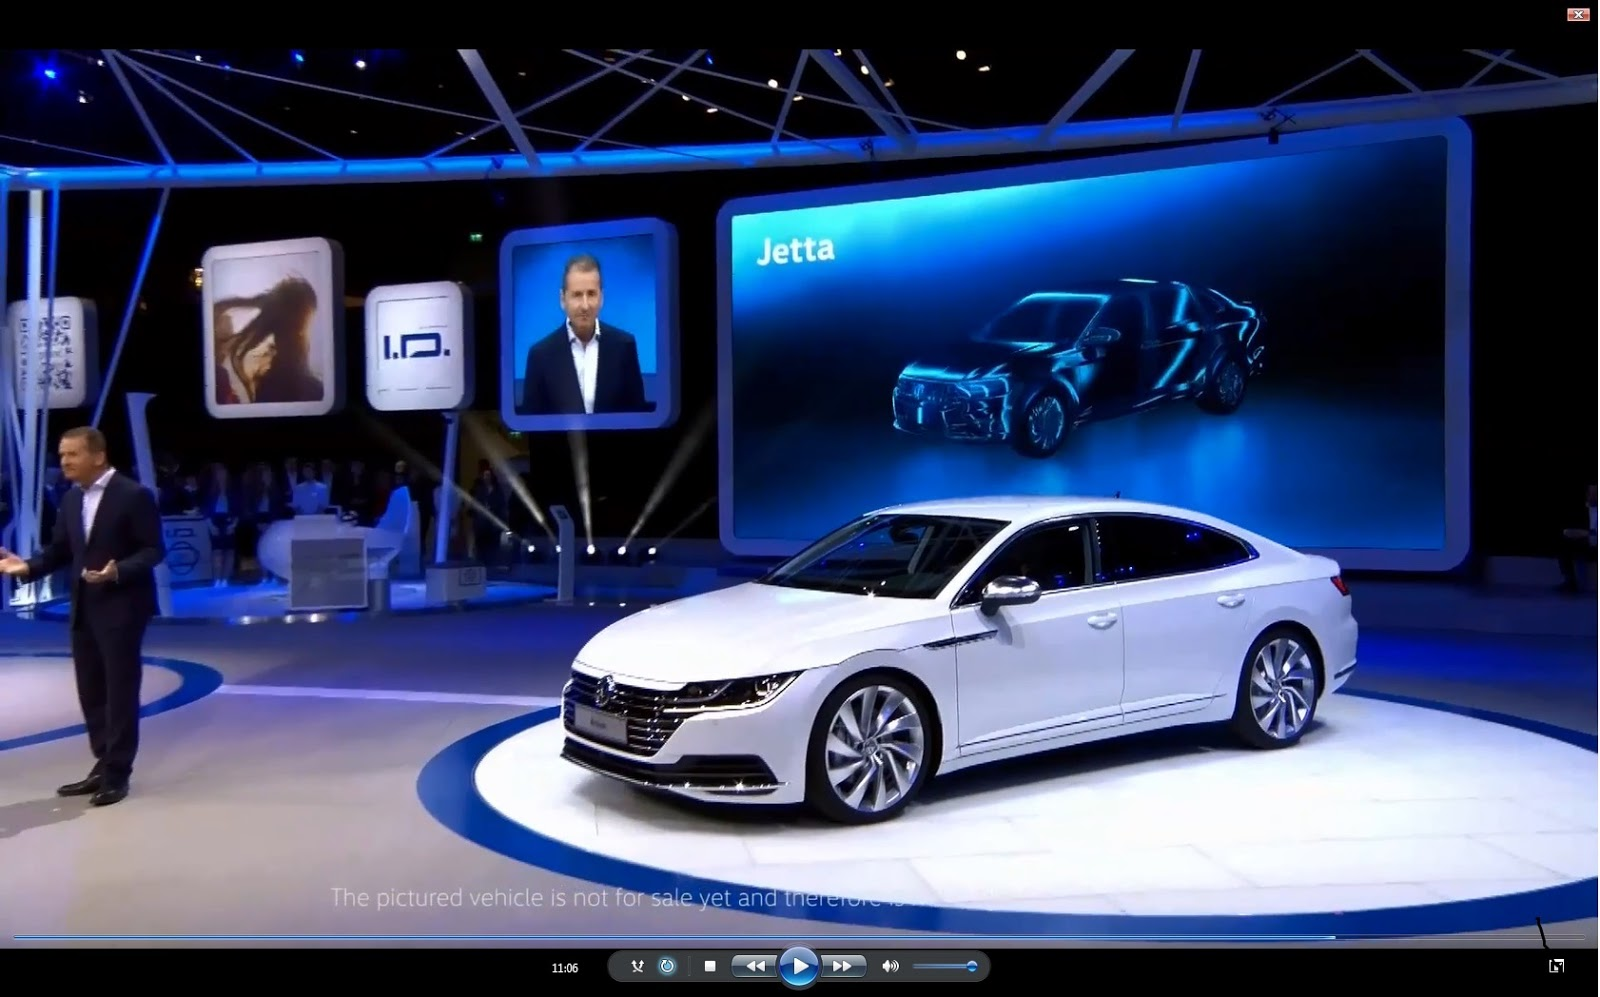 2017/2018 Volkswagen Jetta - CarSpyShots